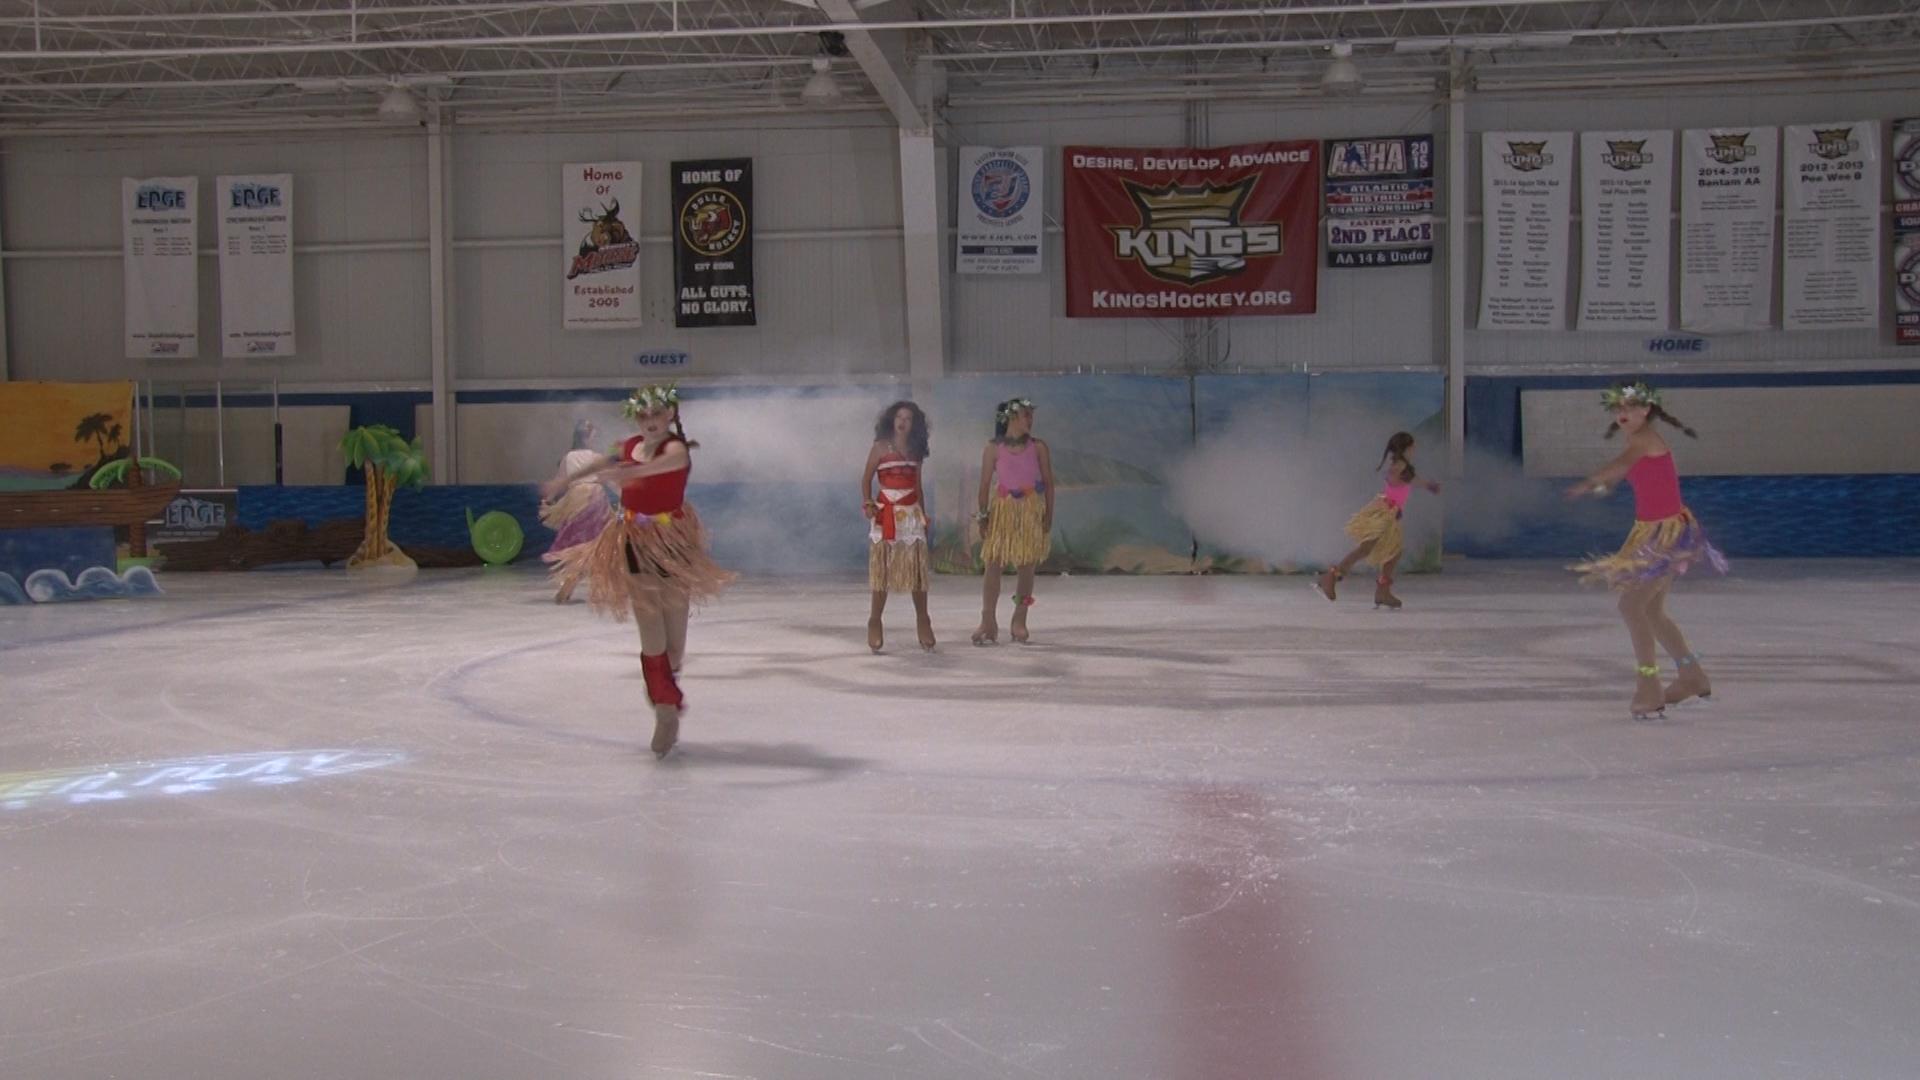 Power Play Maui Skate on Ice 071417.00_18_33_07.Still035.jpg